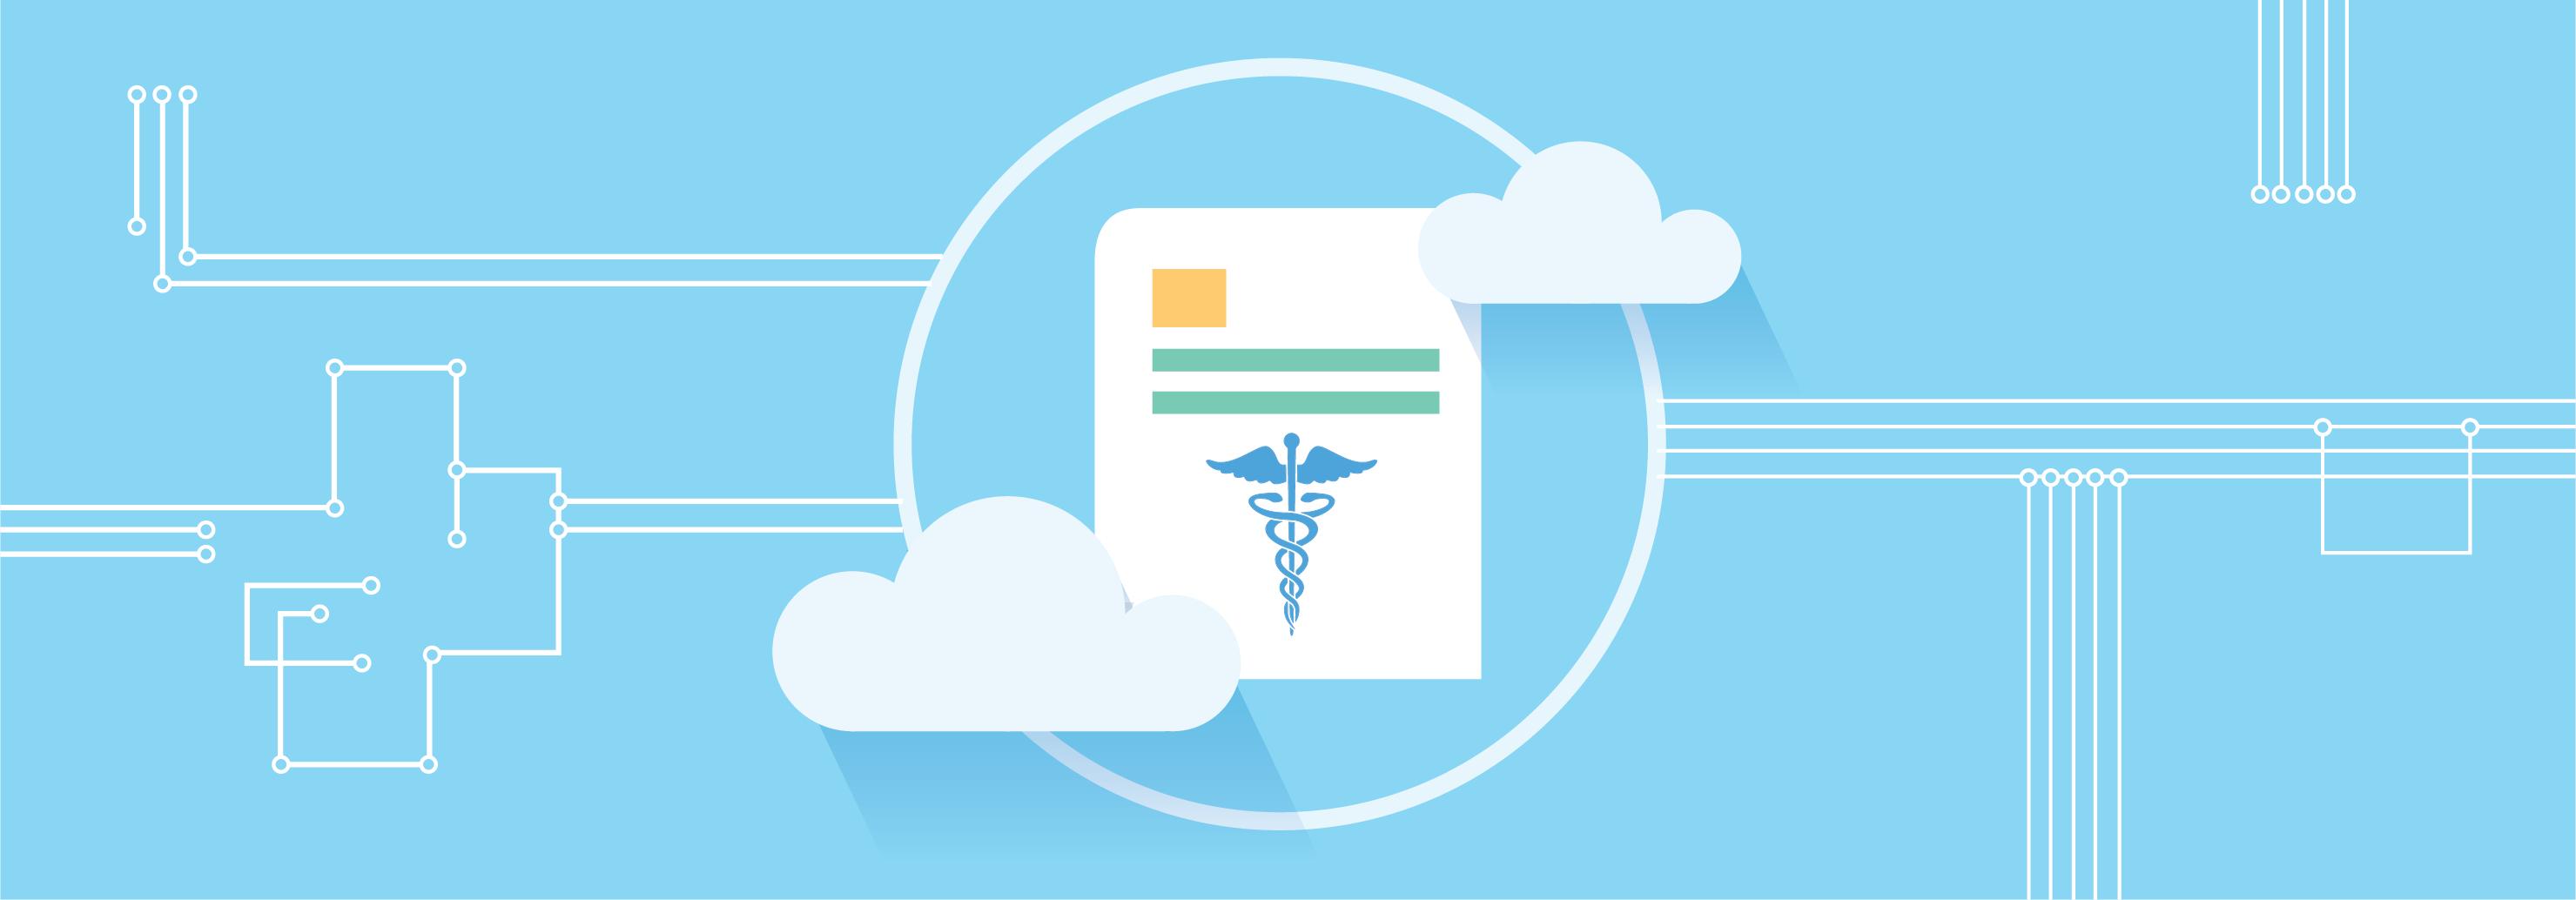 20171020_HIPAA-Compliant-Software_header